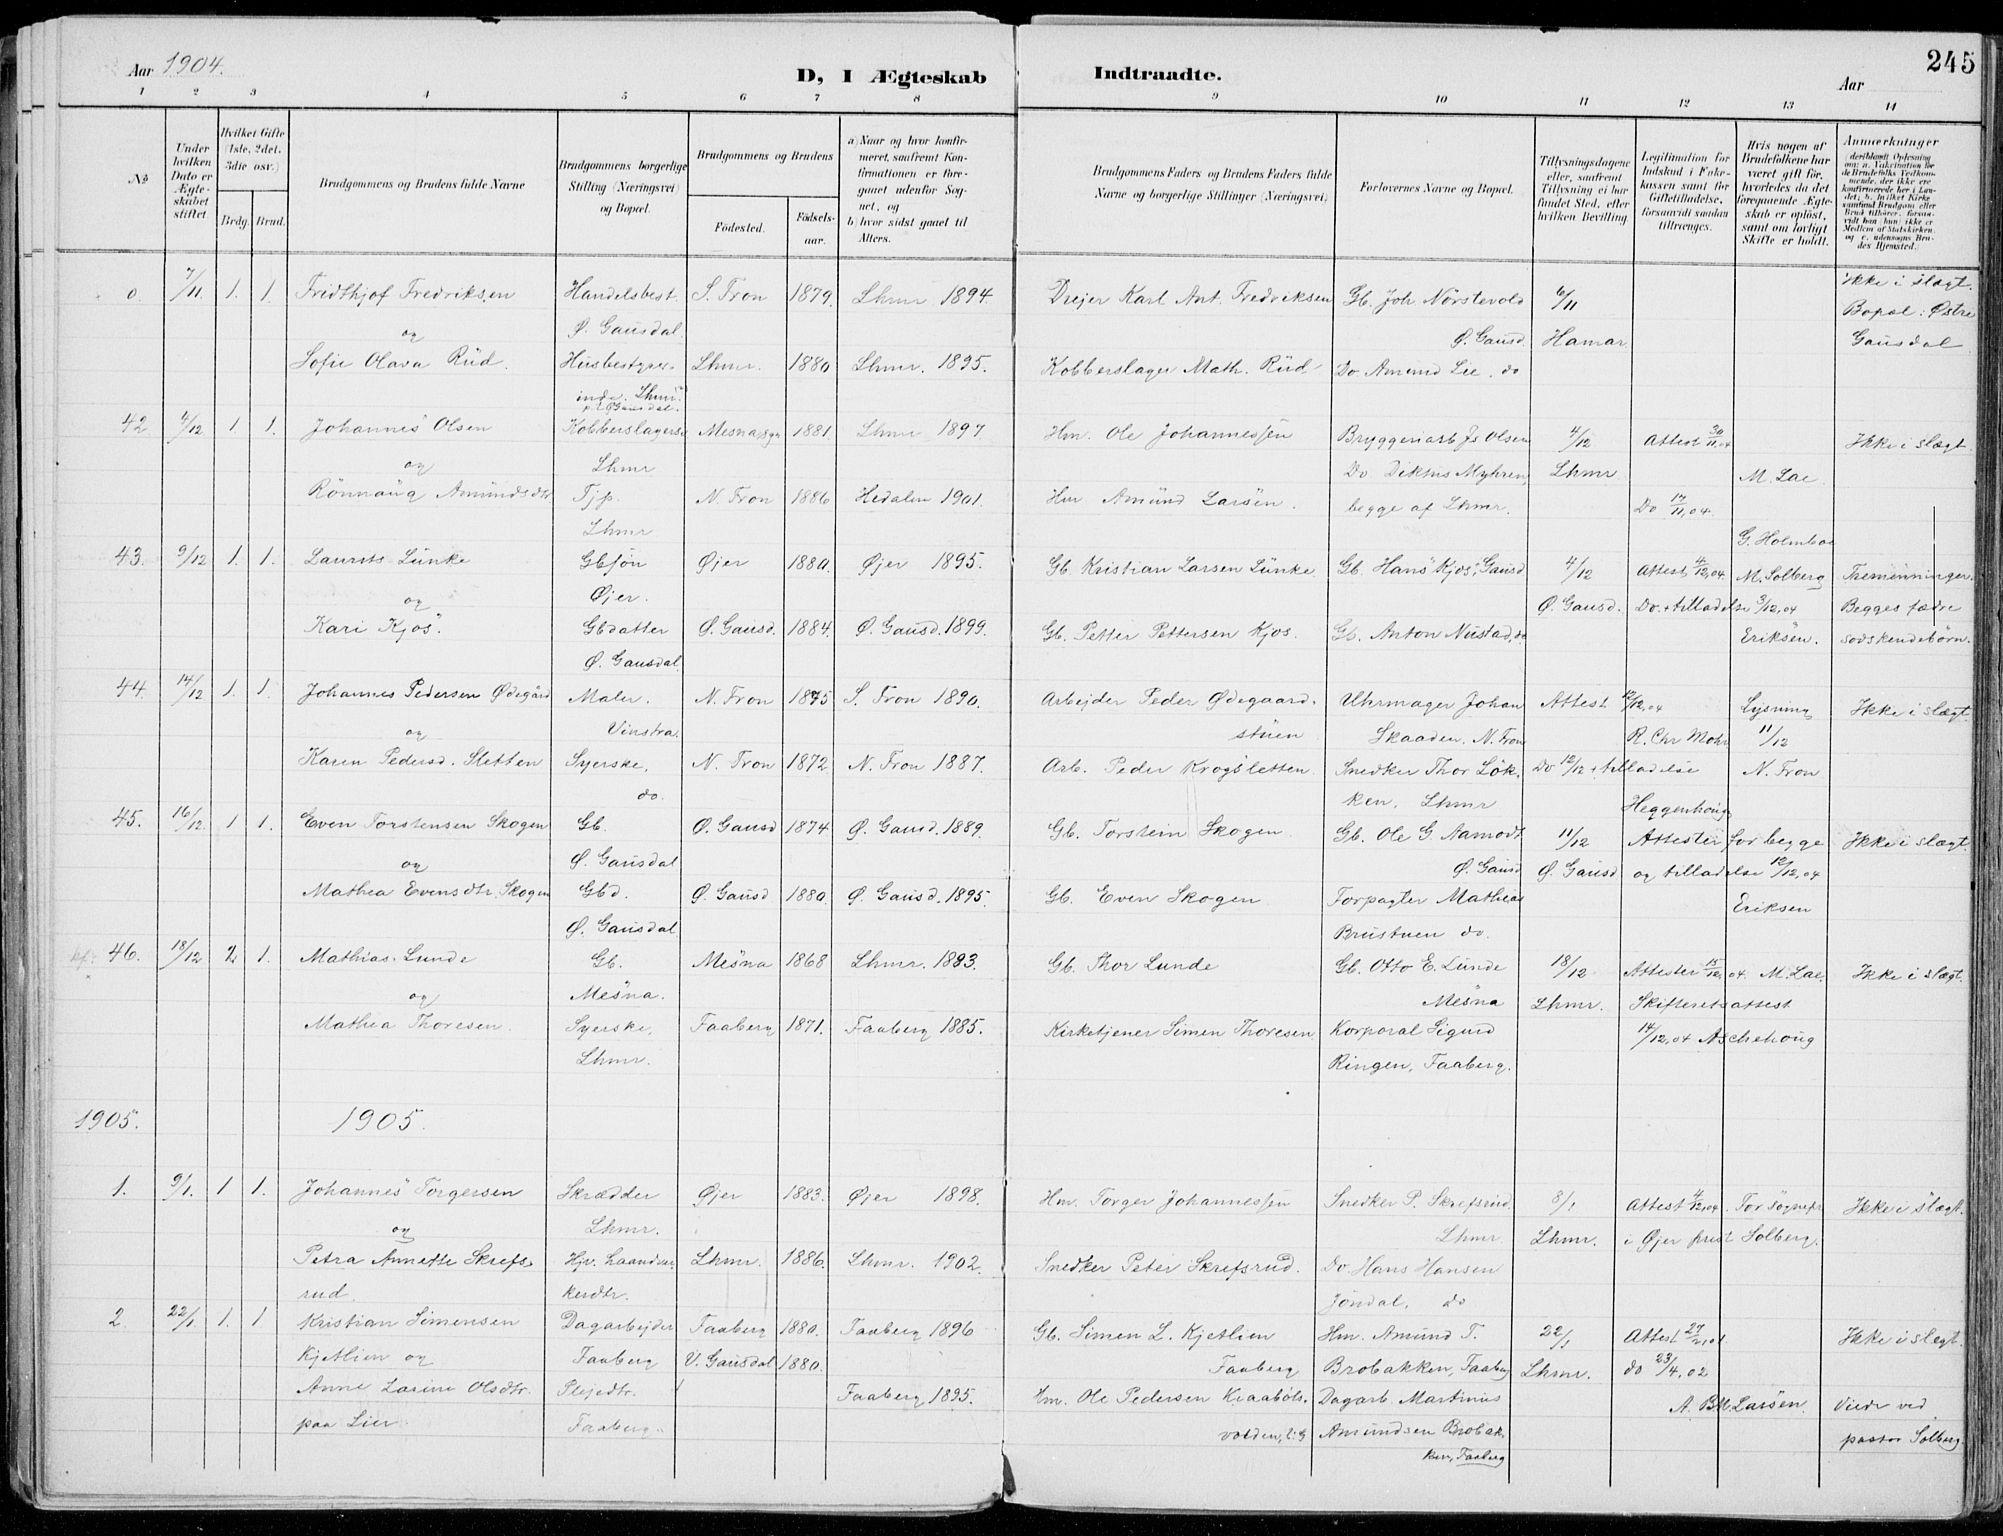 SAH, Lillehammer prestekontor, Ministerialbok nr. 1, 1901-1916, s. 245